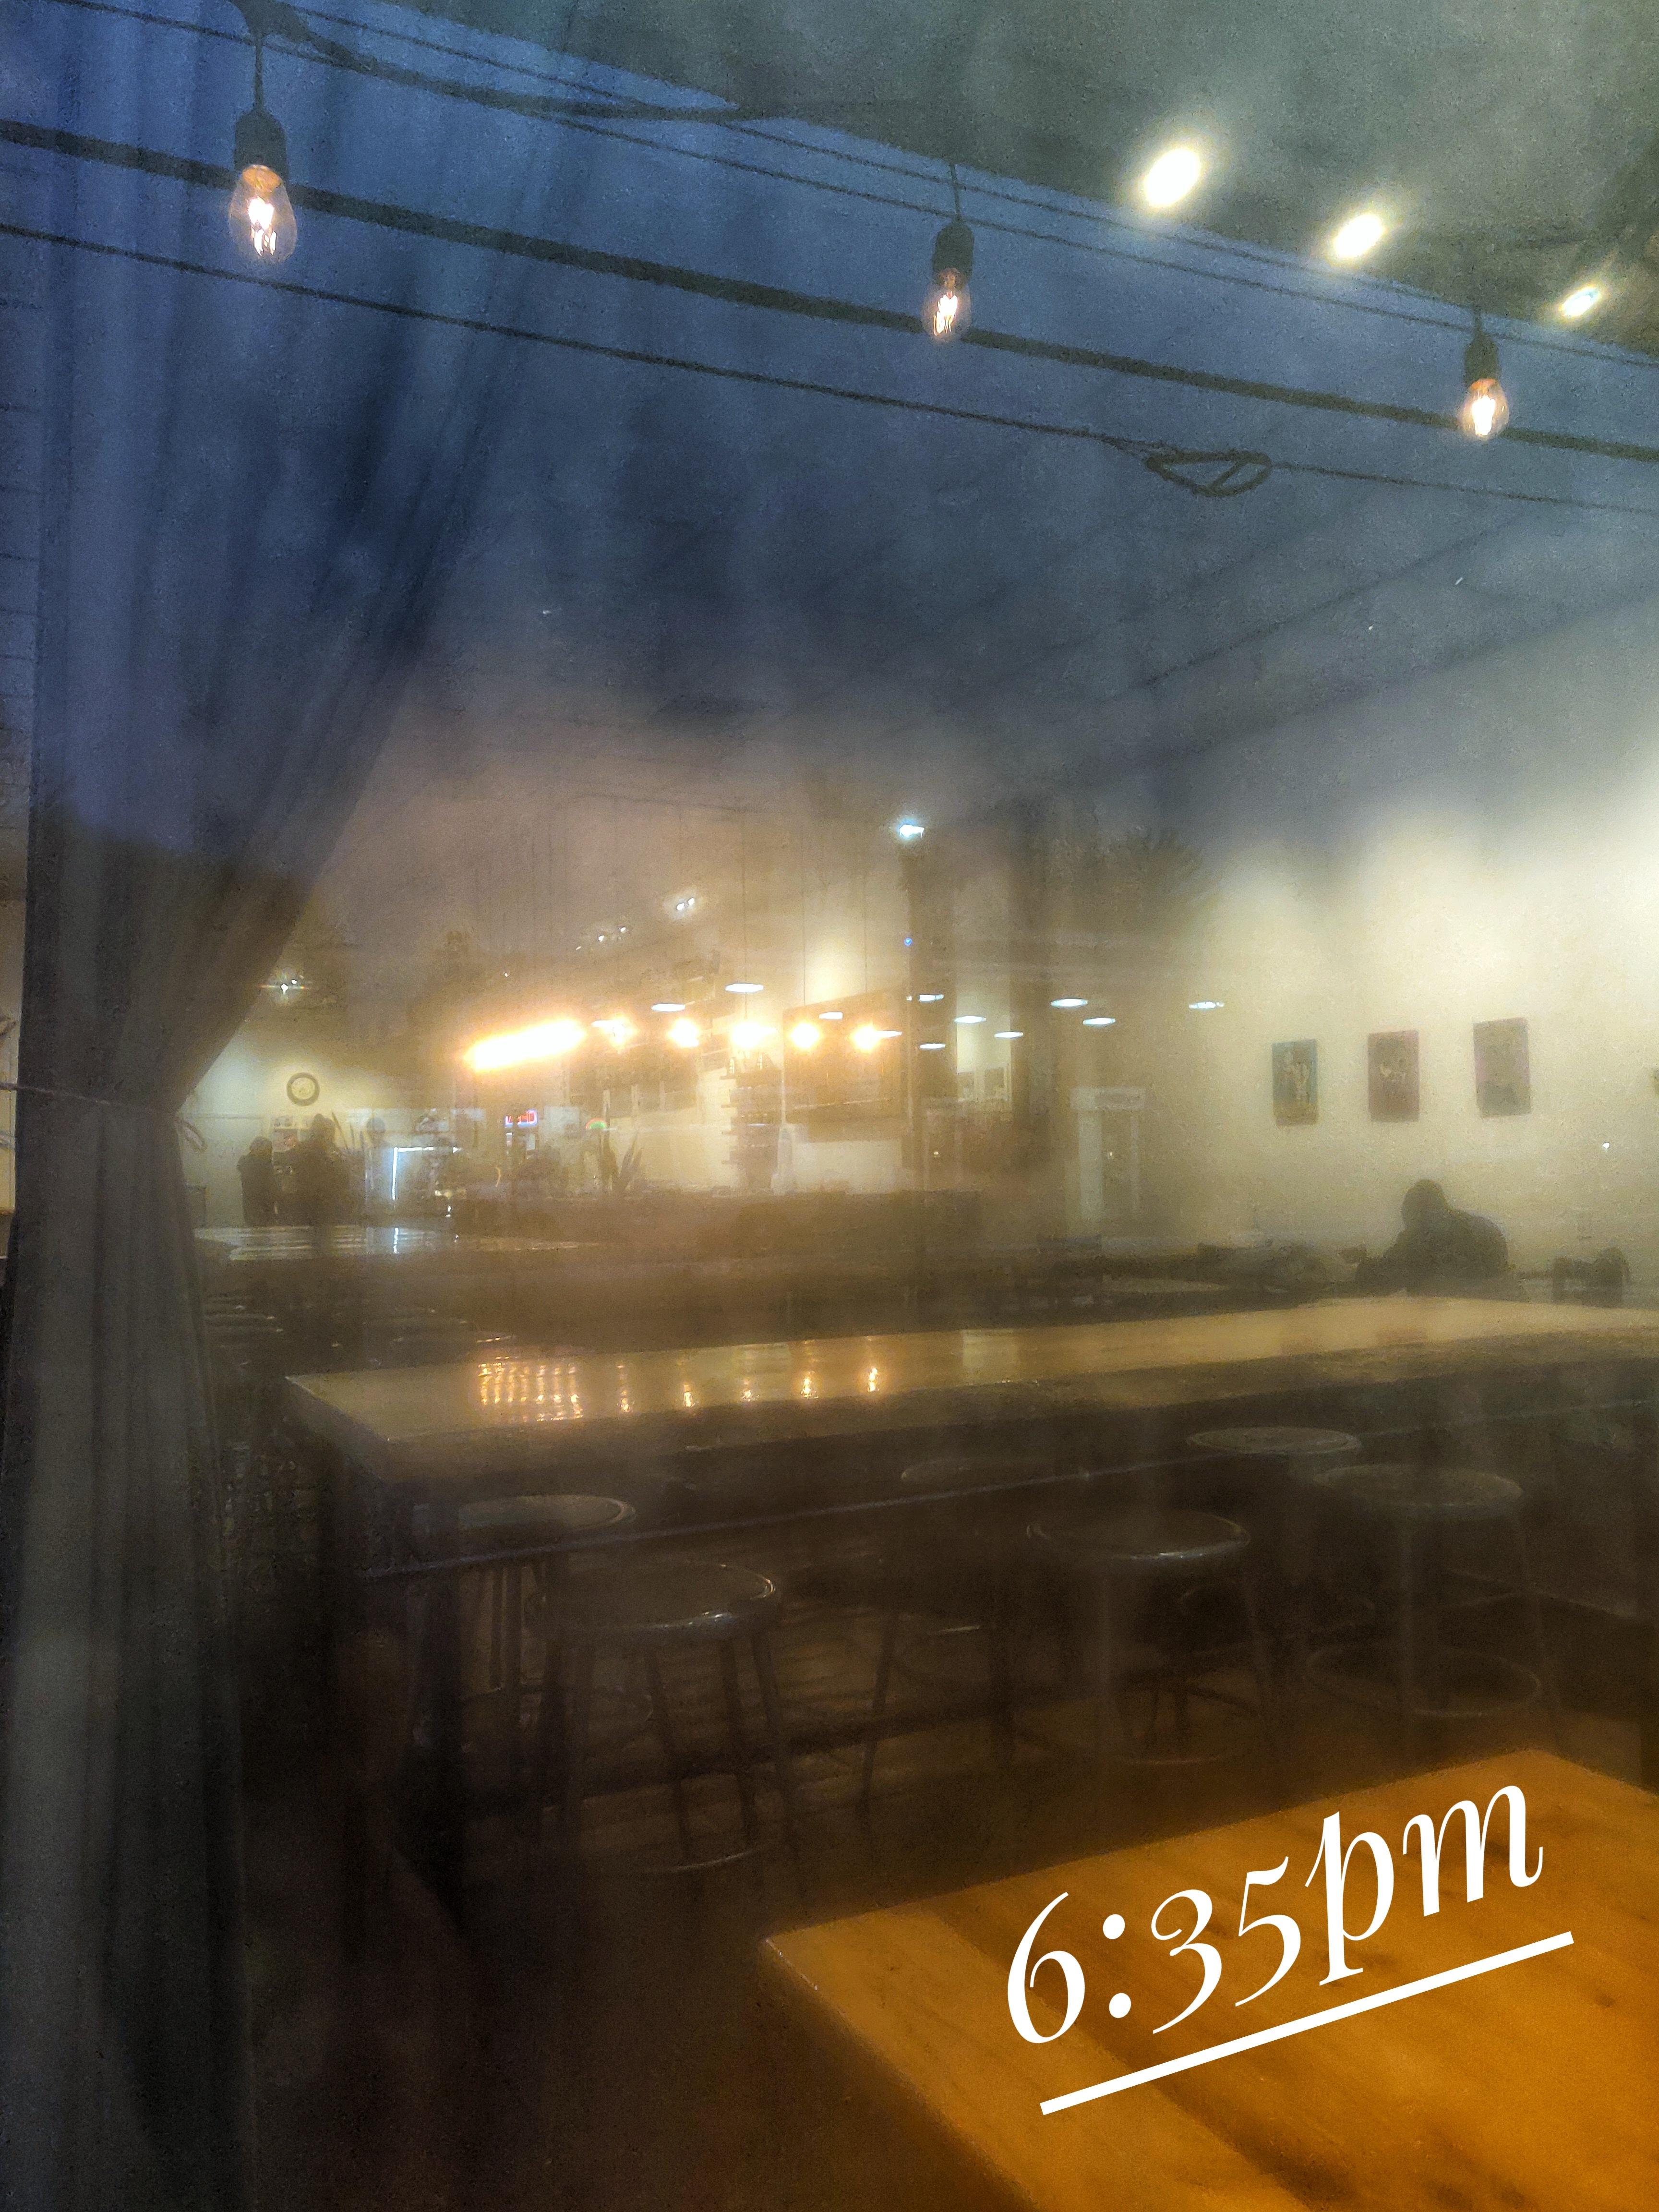 6_35pm coffee shop Sweitzer.jpeg